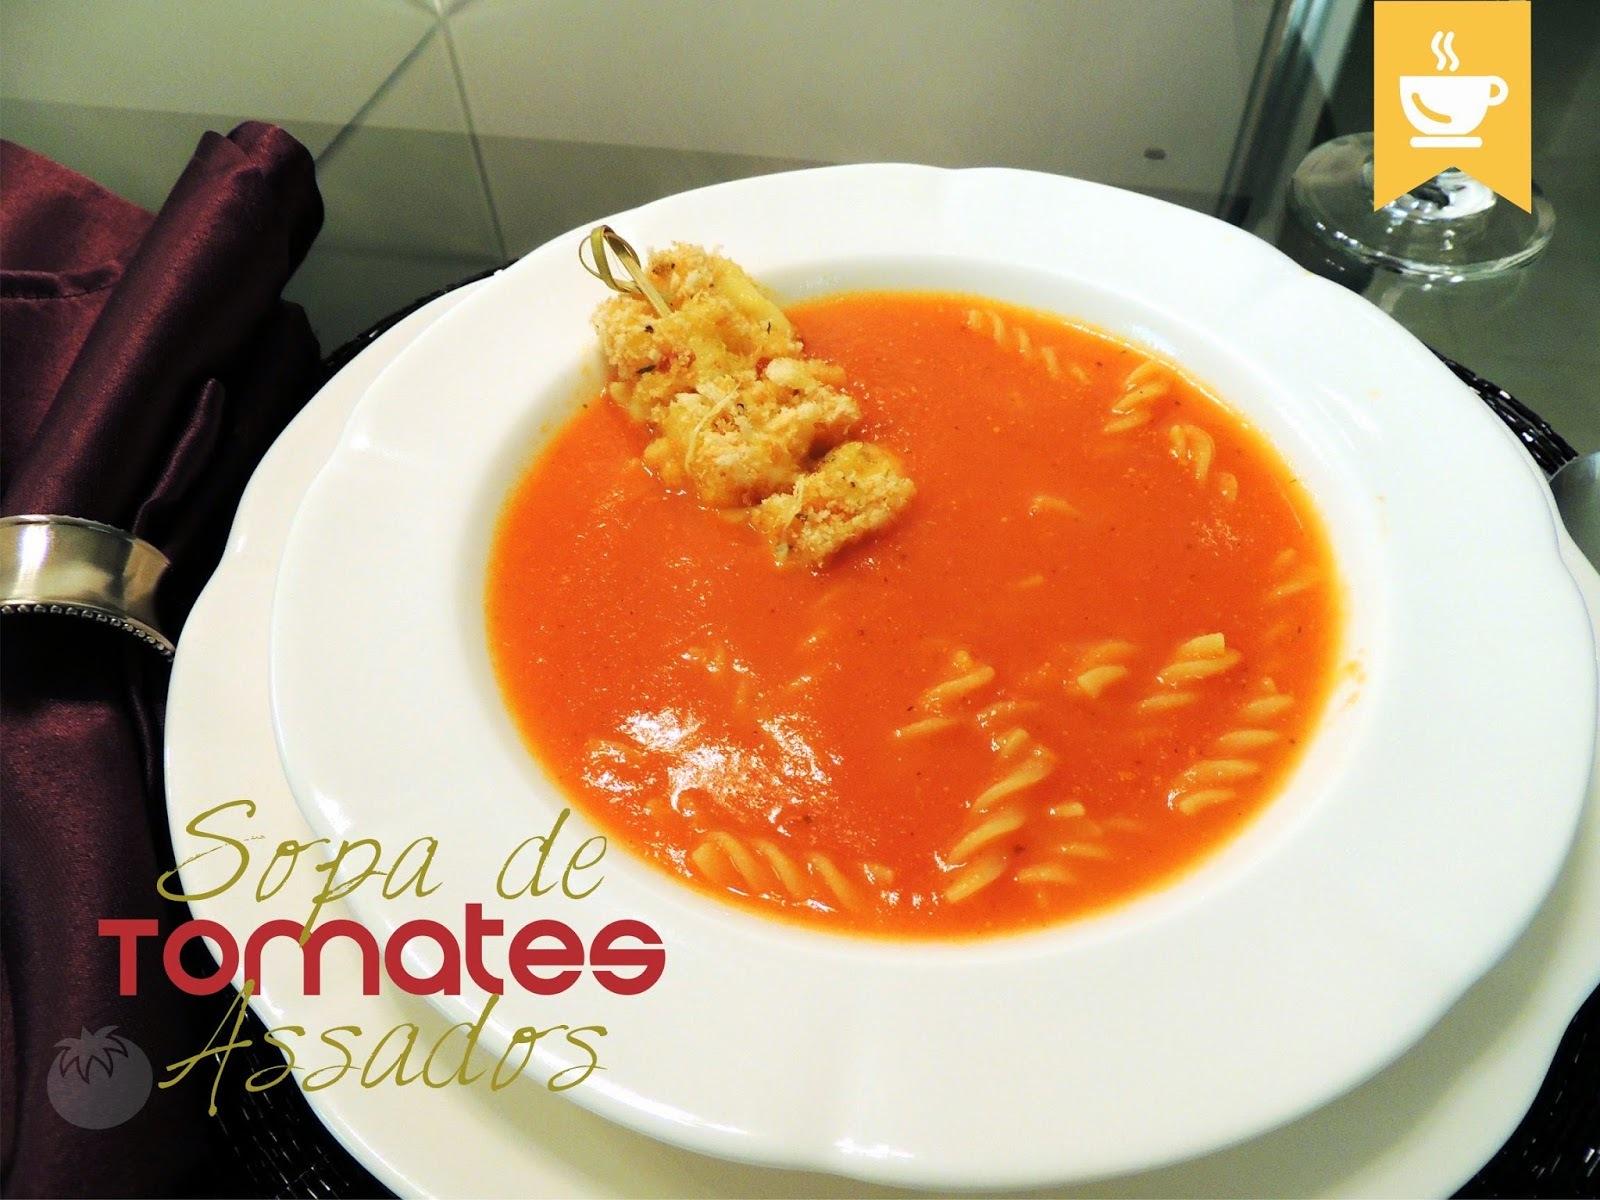 sopa de cebola e alho simples batida no liquidificador